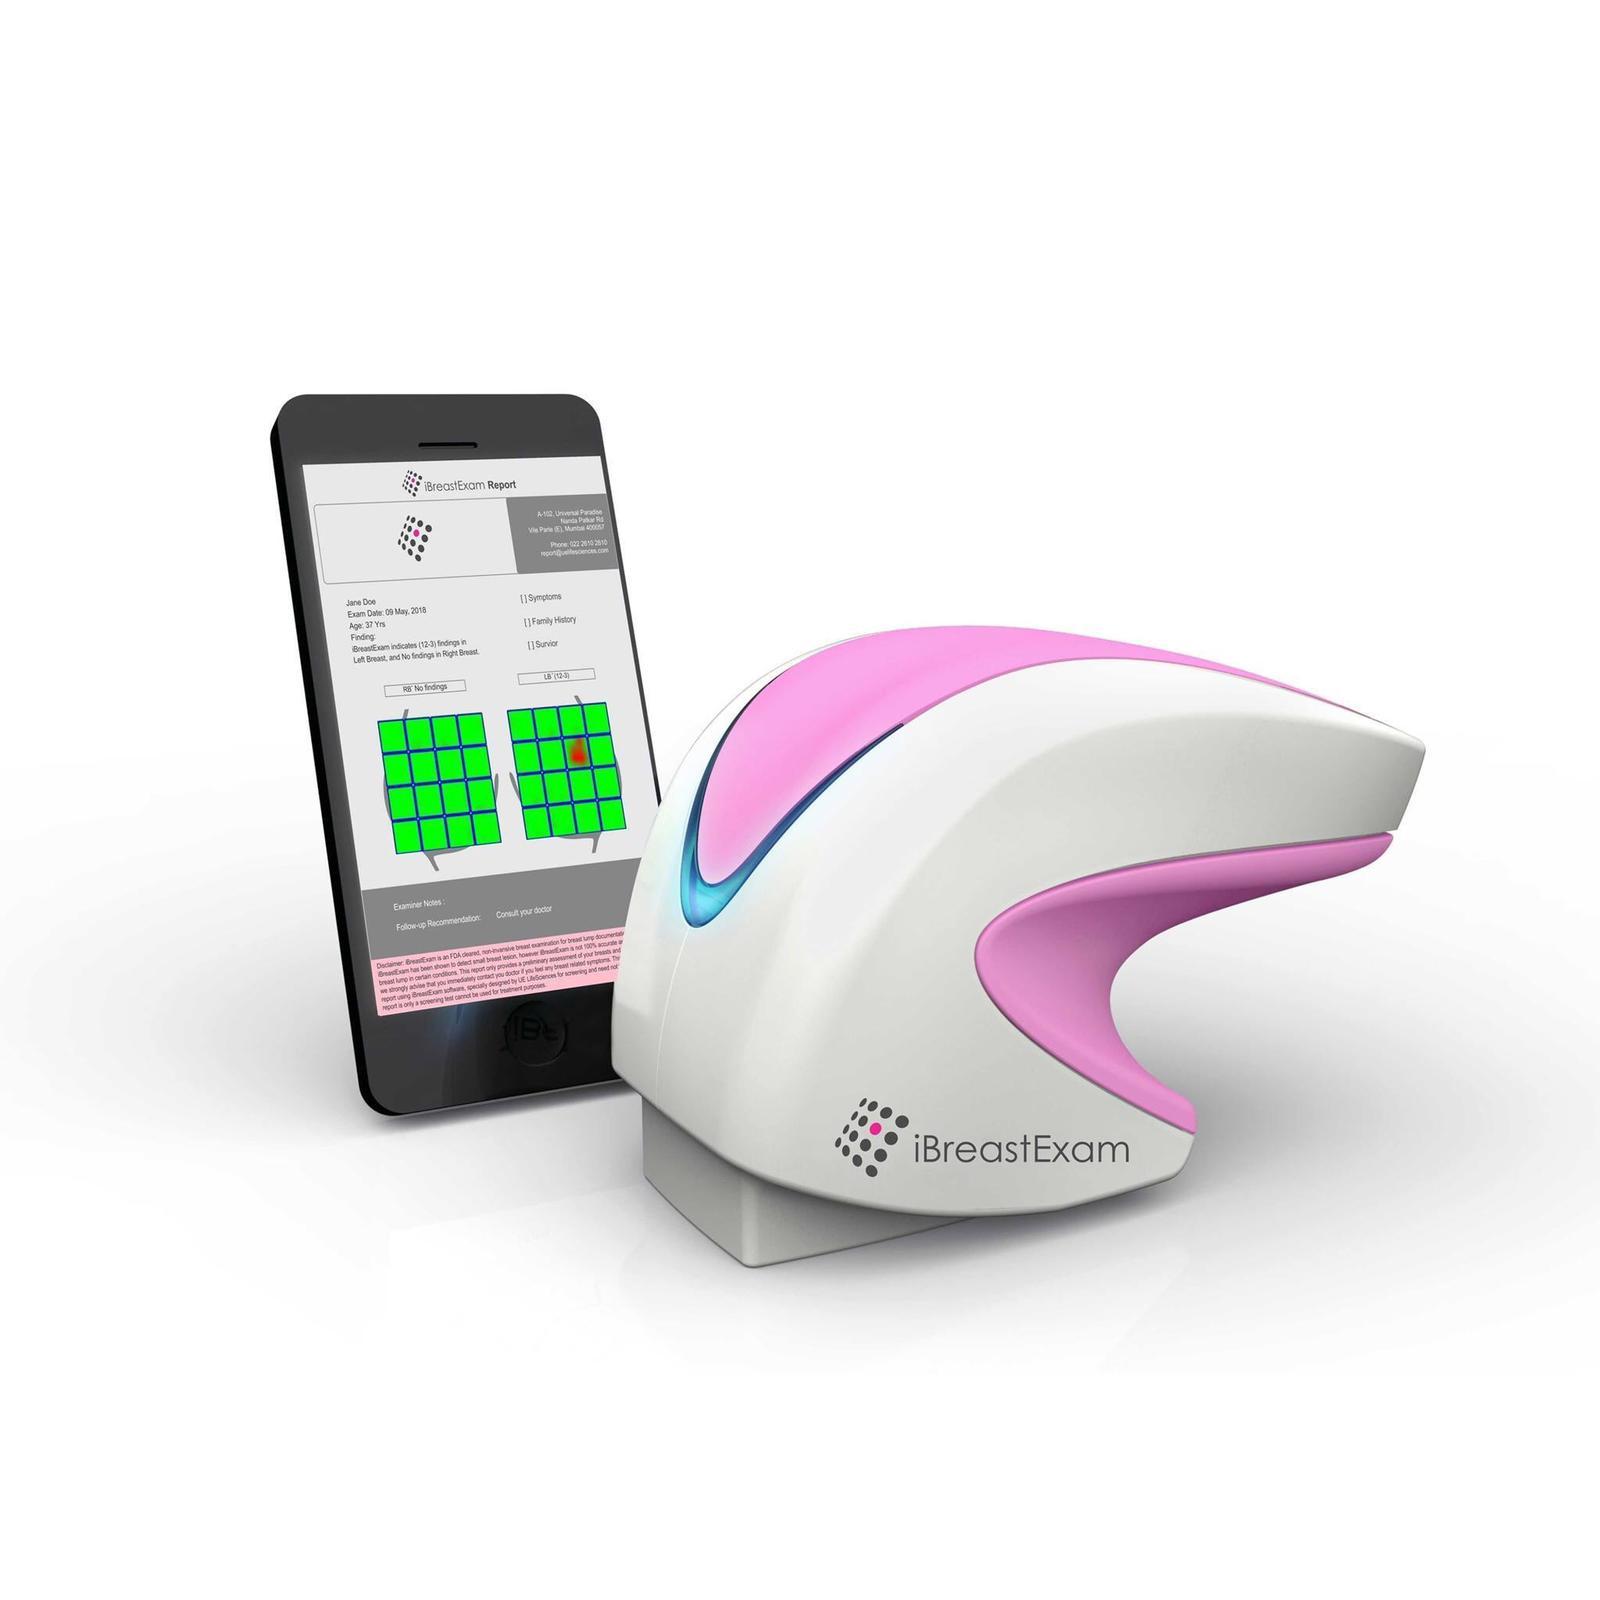 iBreast Exam analisi cancro seno tumore